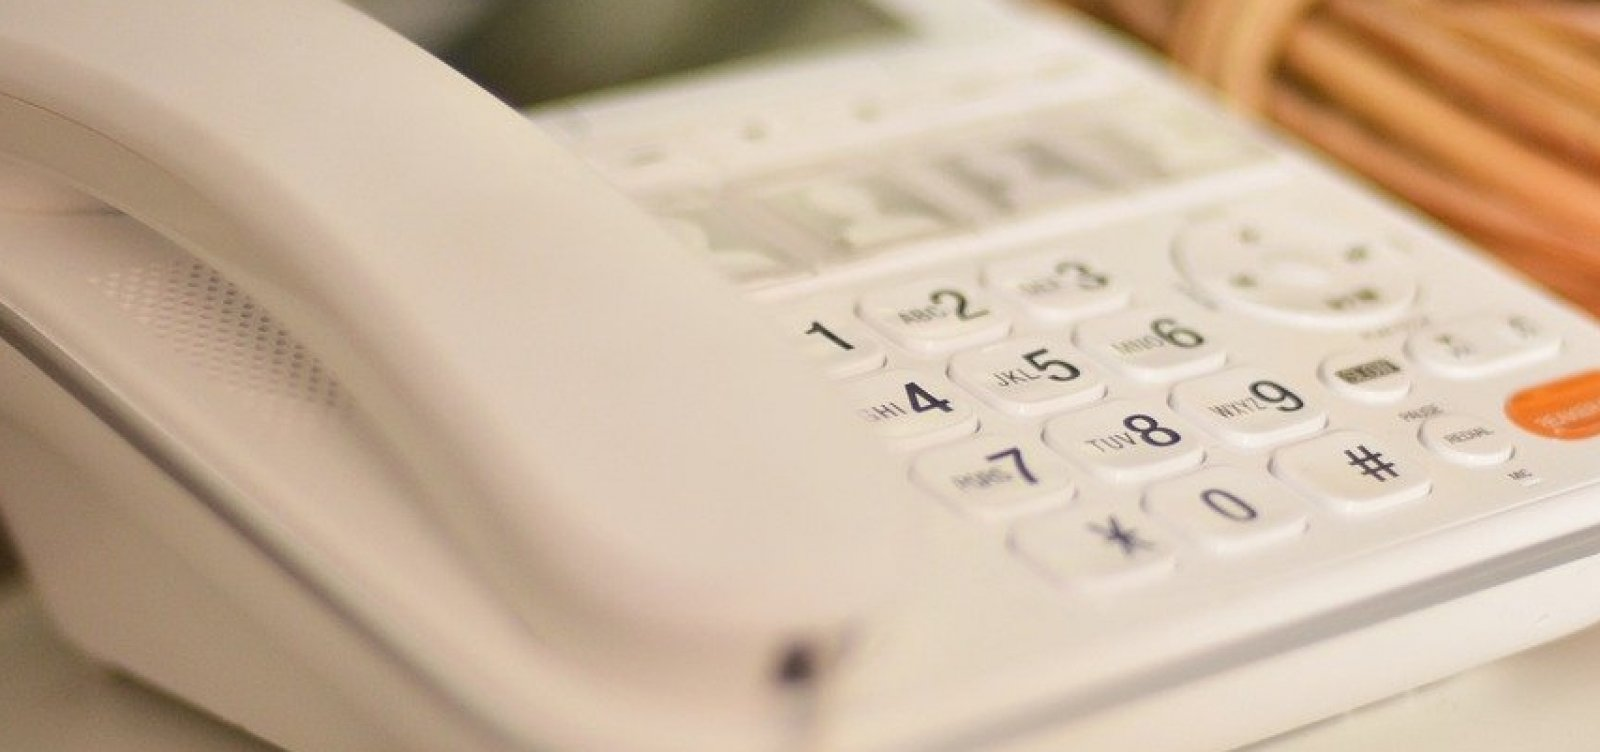 [Idec dá sugestões à Anatel para diminuir telemarketing indesejado]